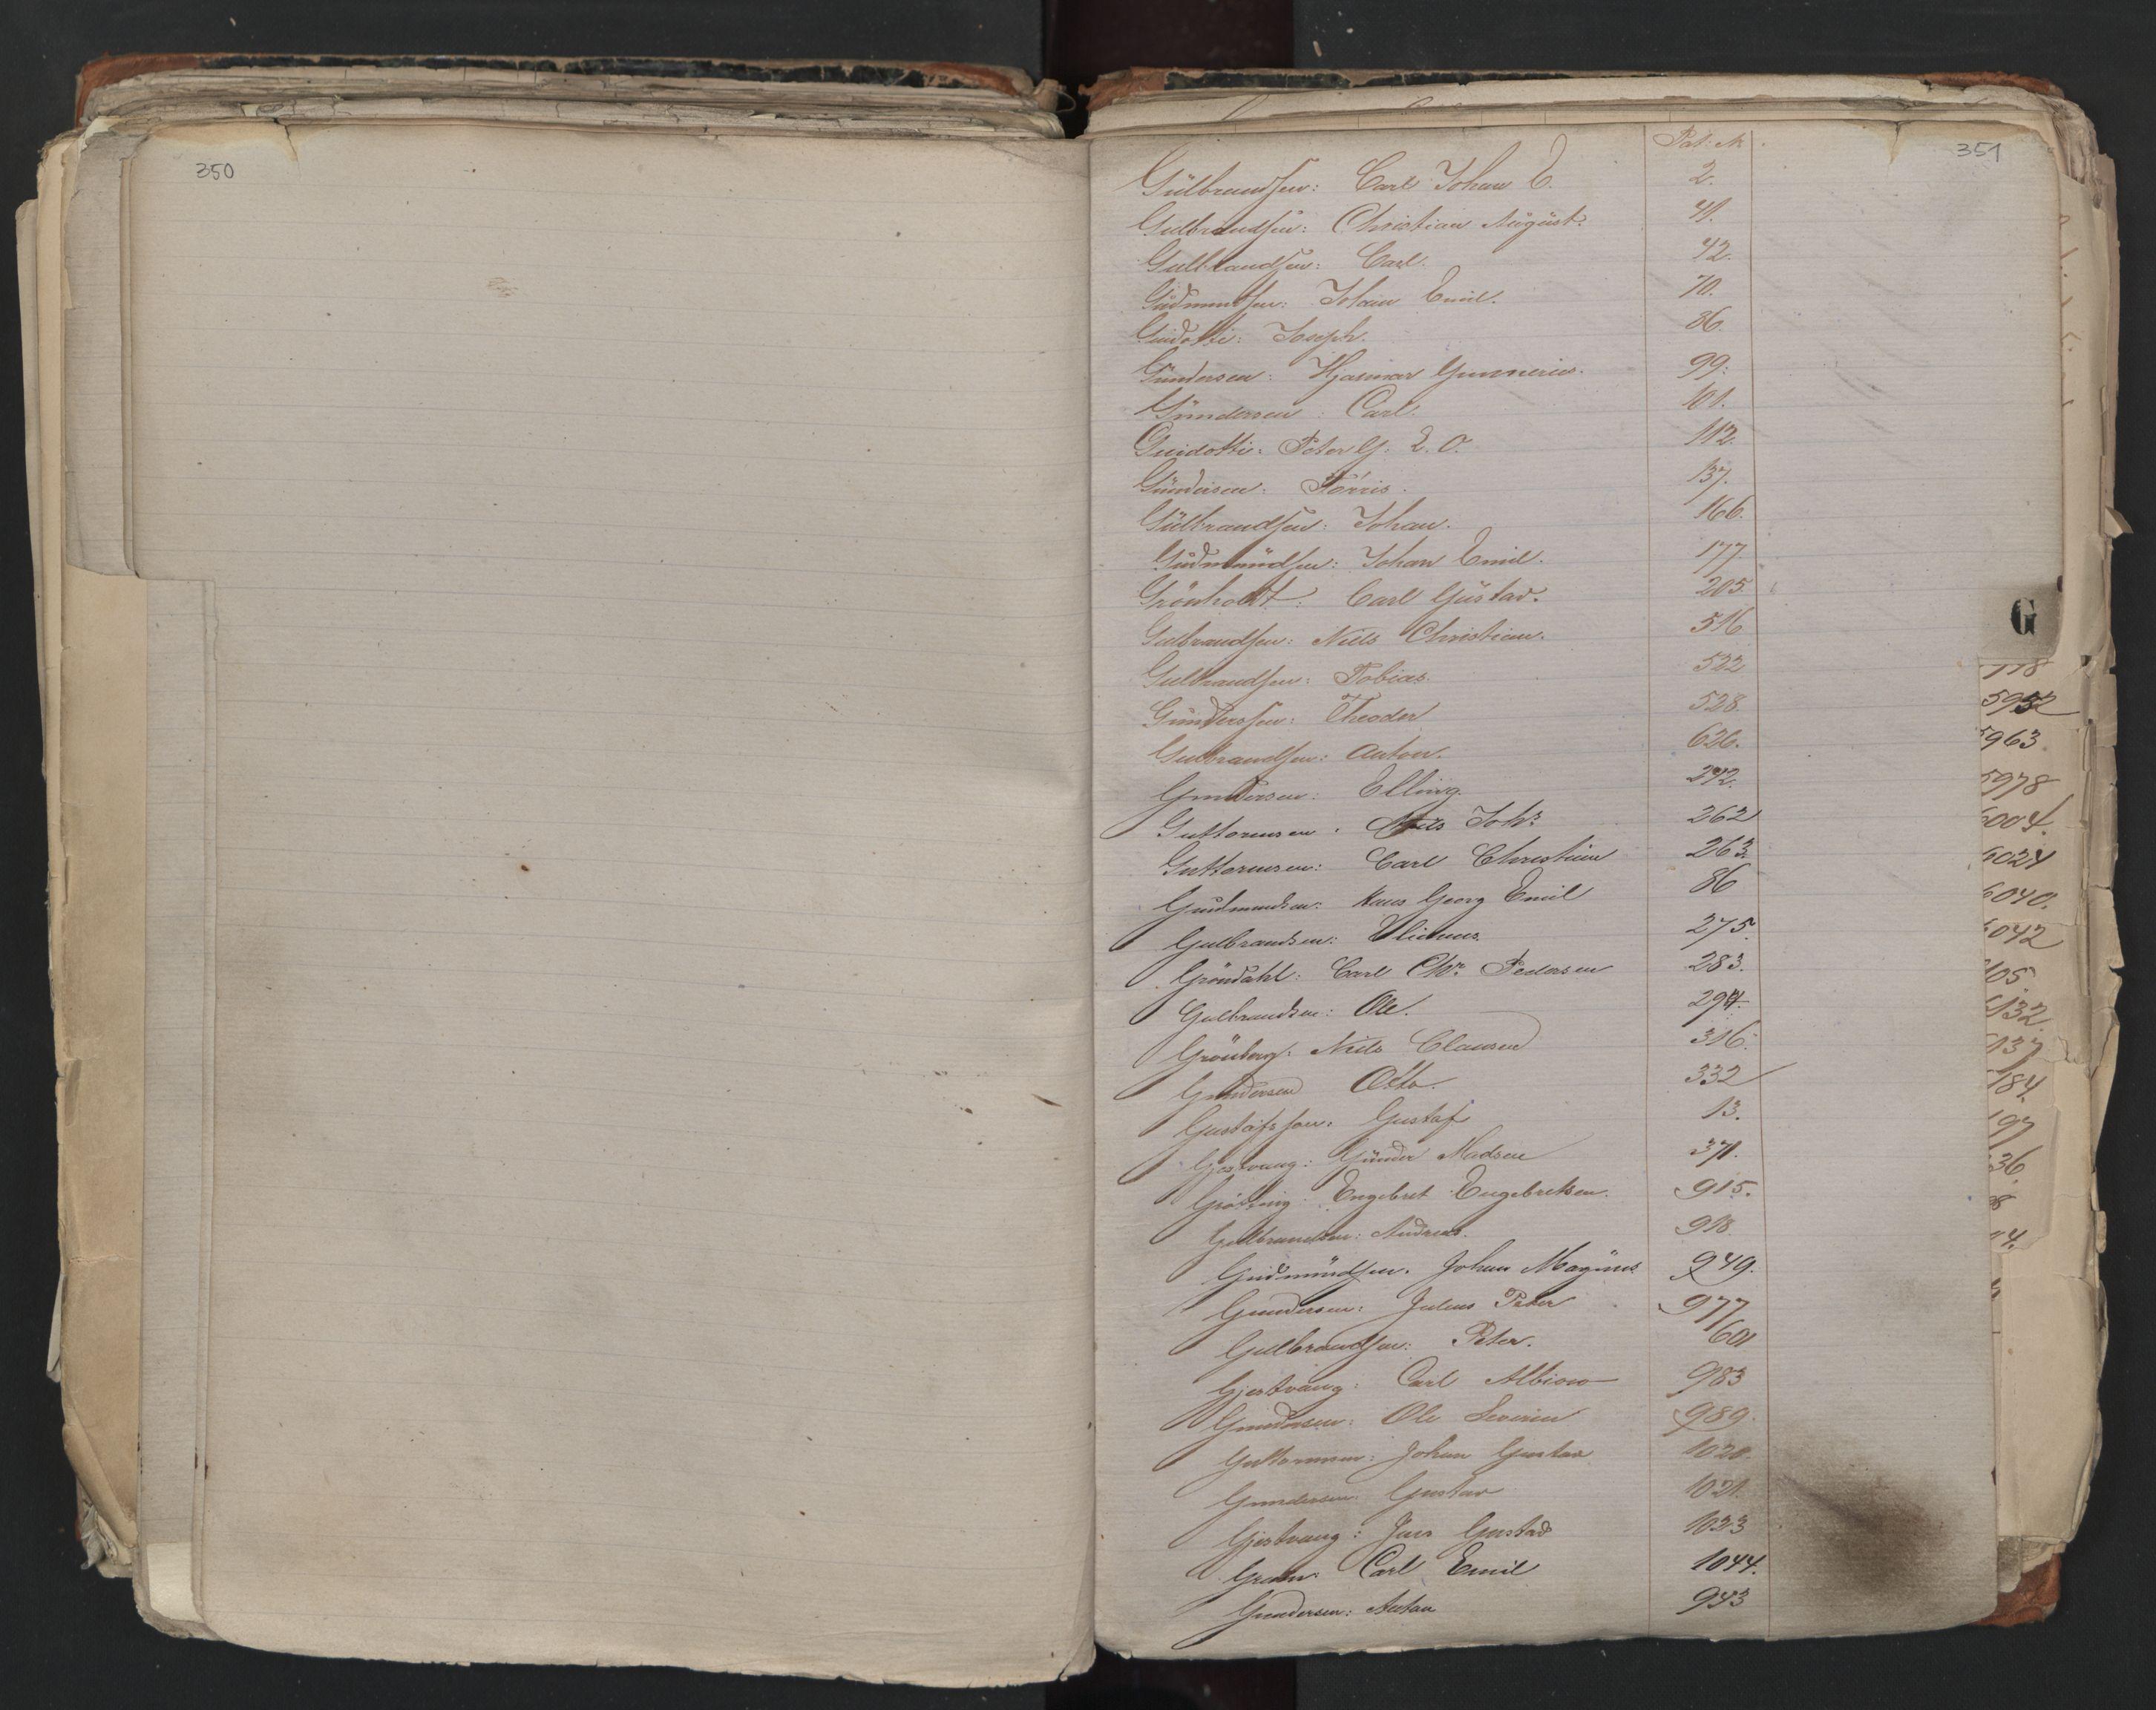 SAO, Oslo sjømannskontor, F/Fa/L0001: Register for Kristiania krets, 1866-1891, s. 350-351